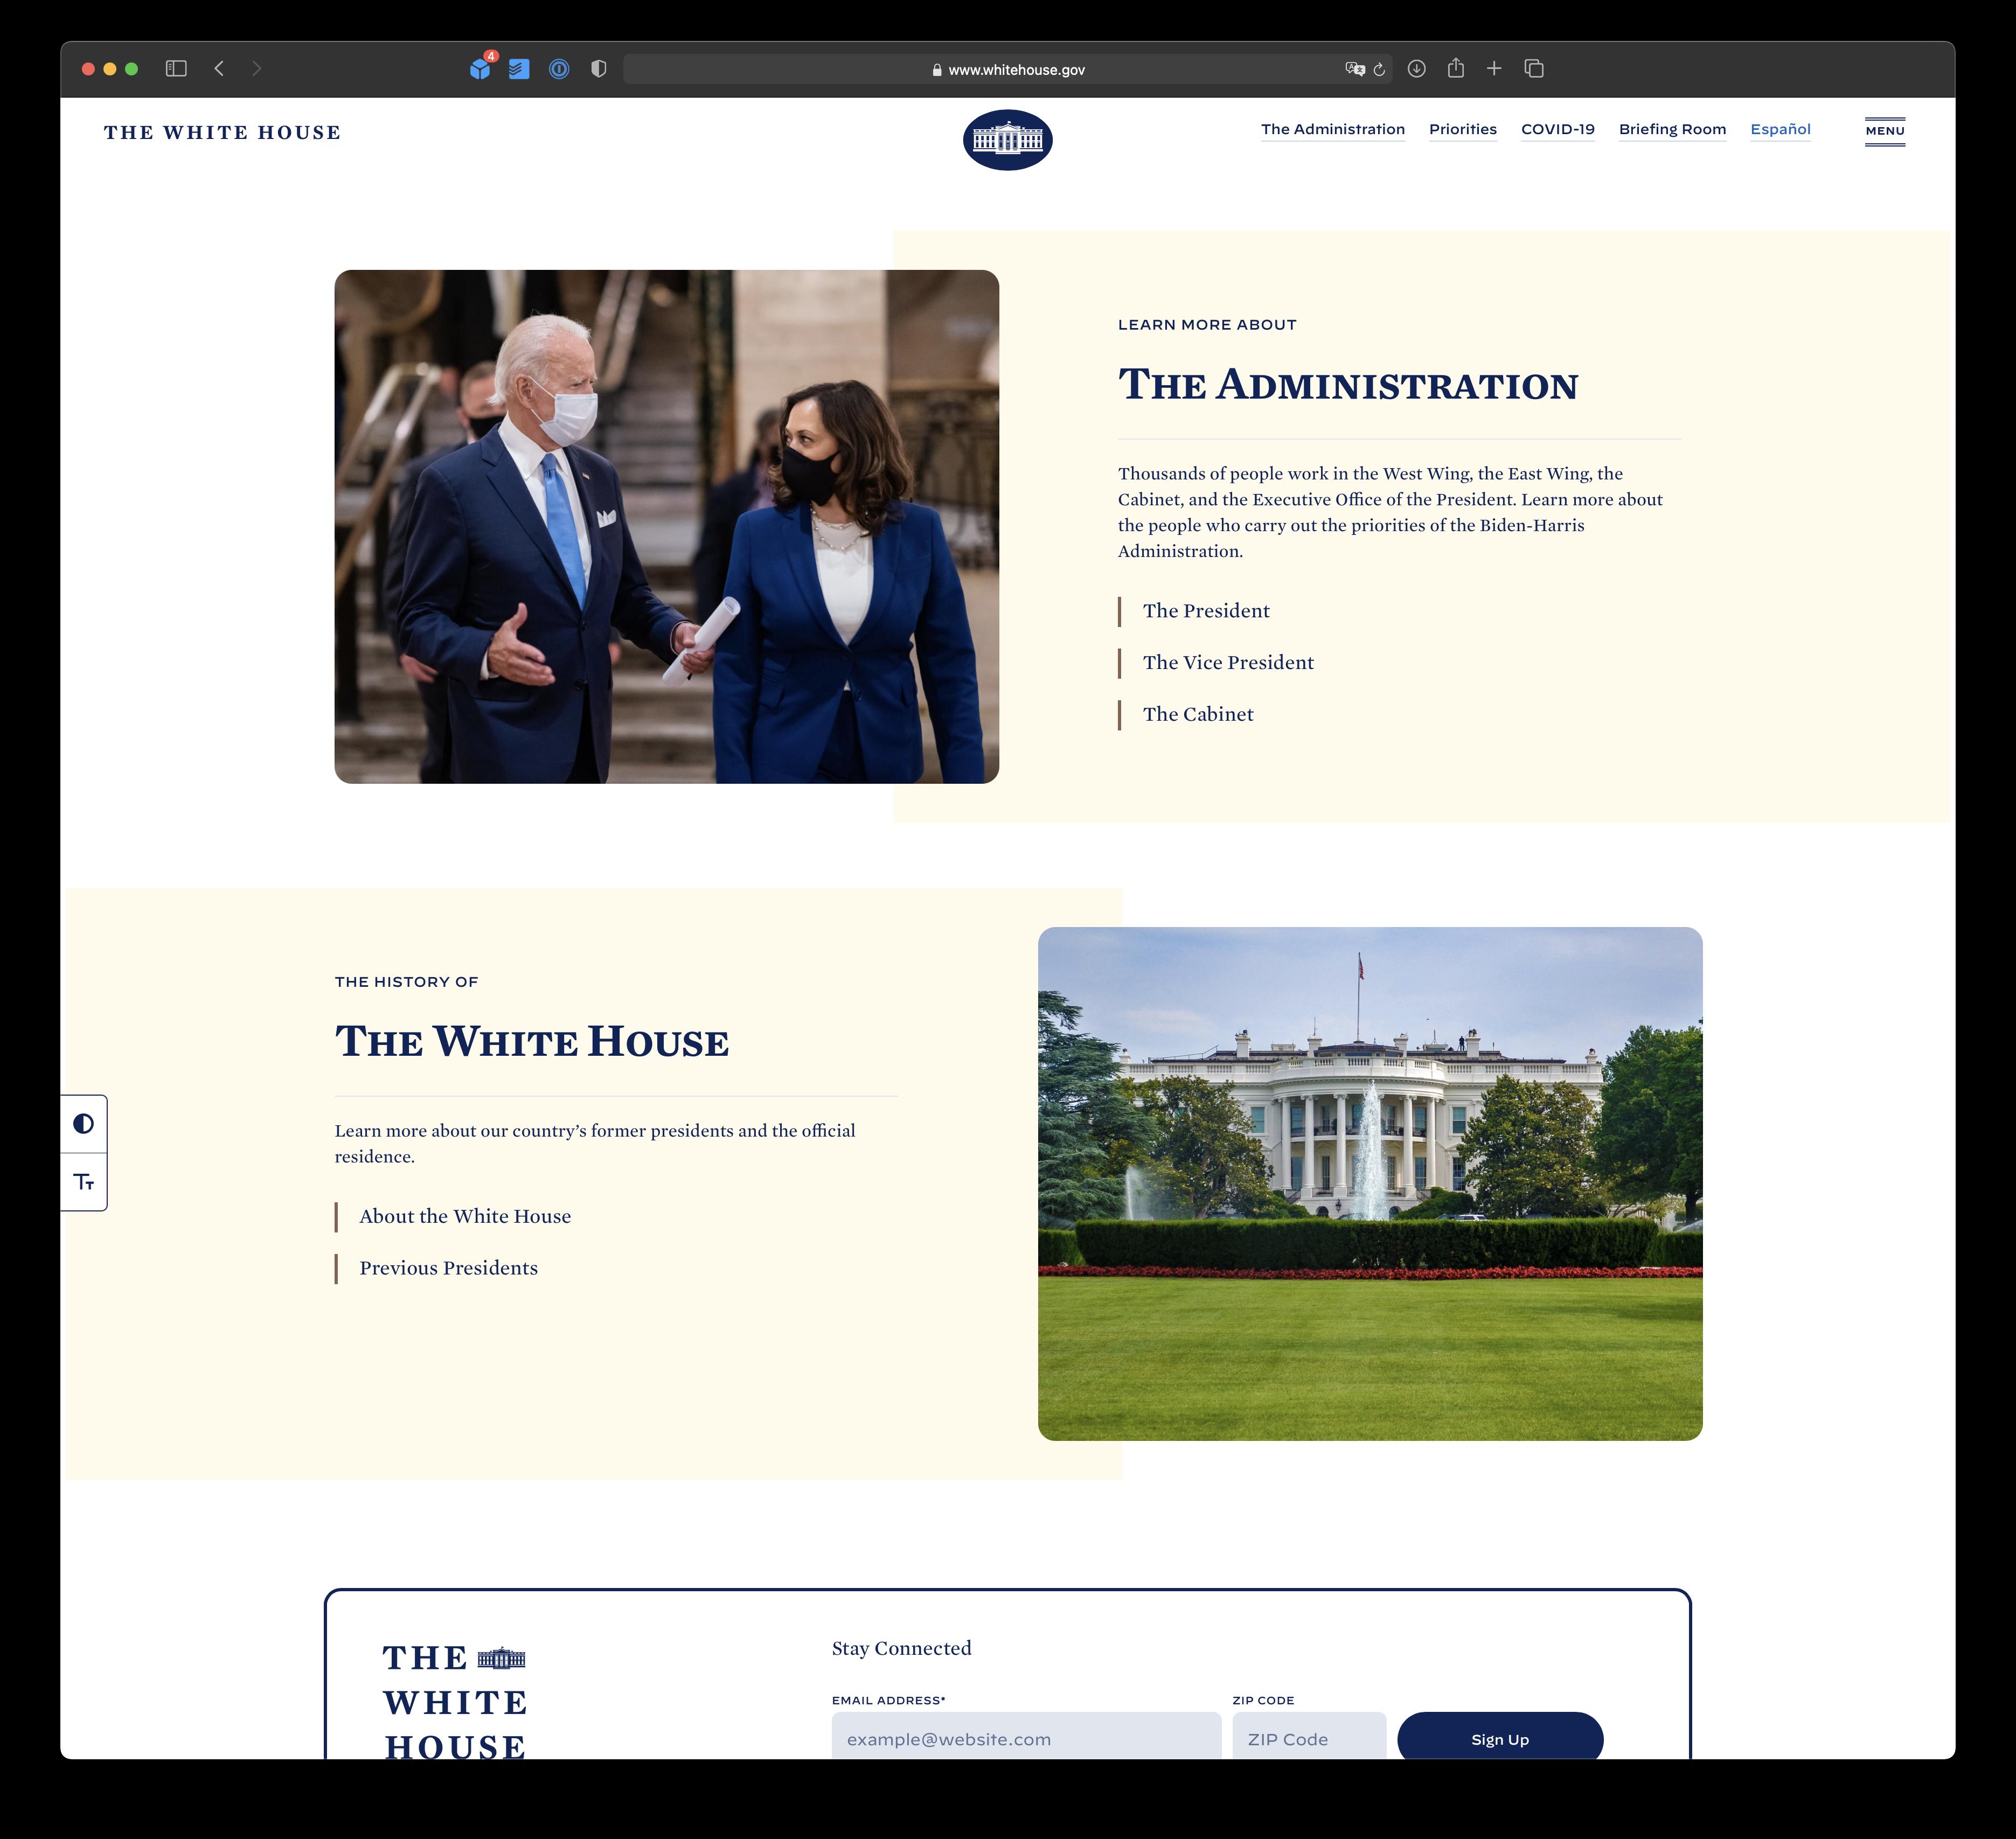 WhiteHouse.gov with ad blocker